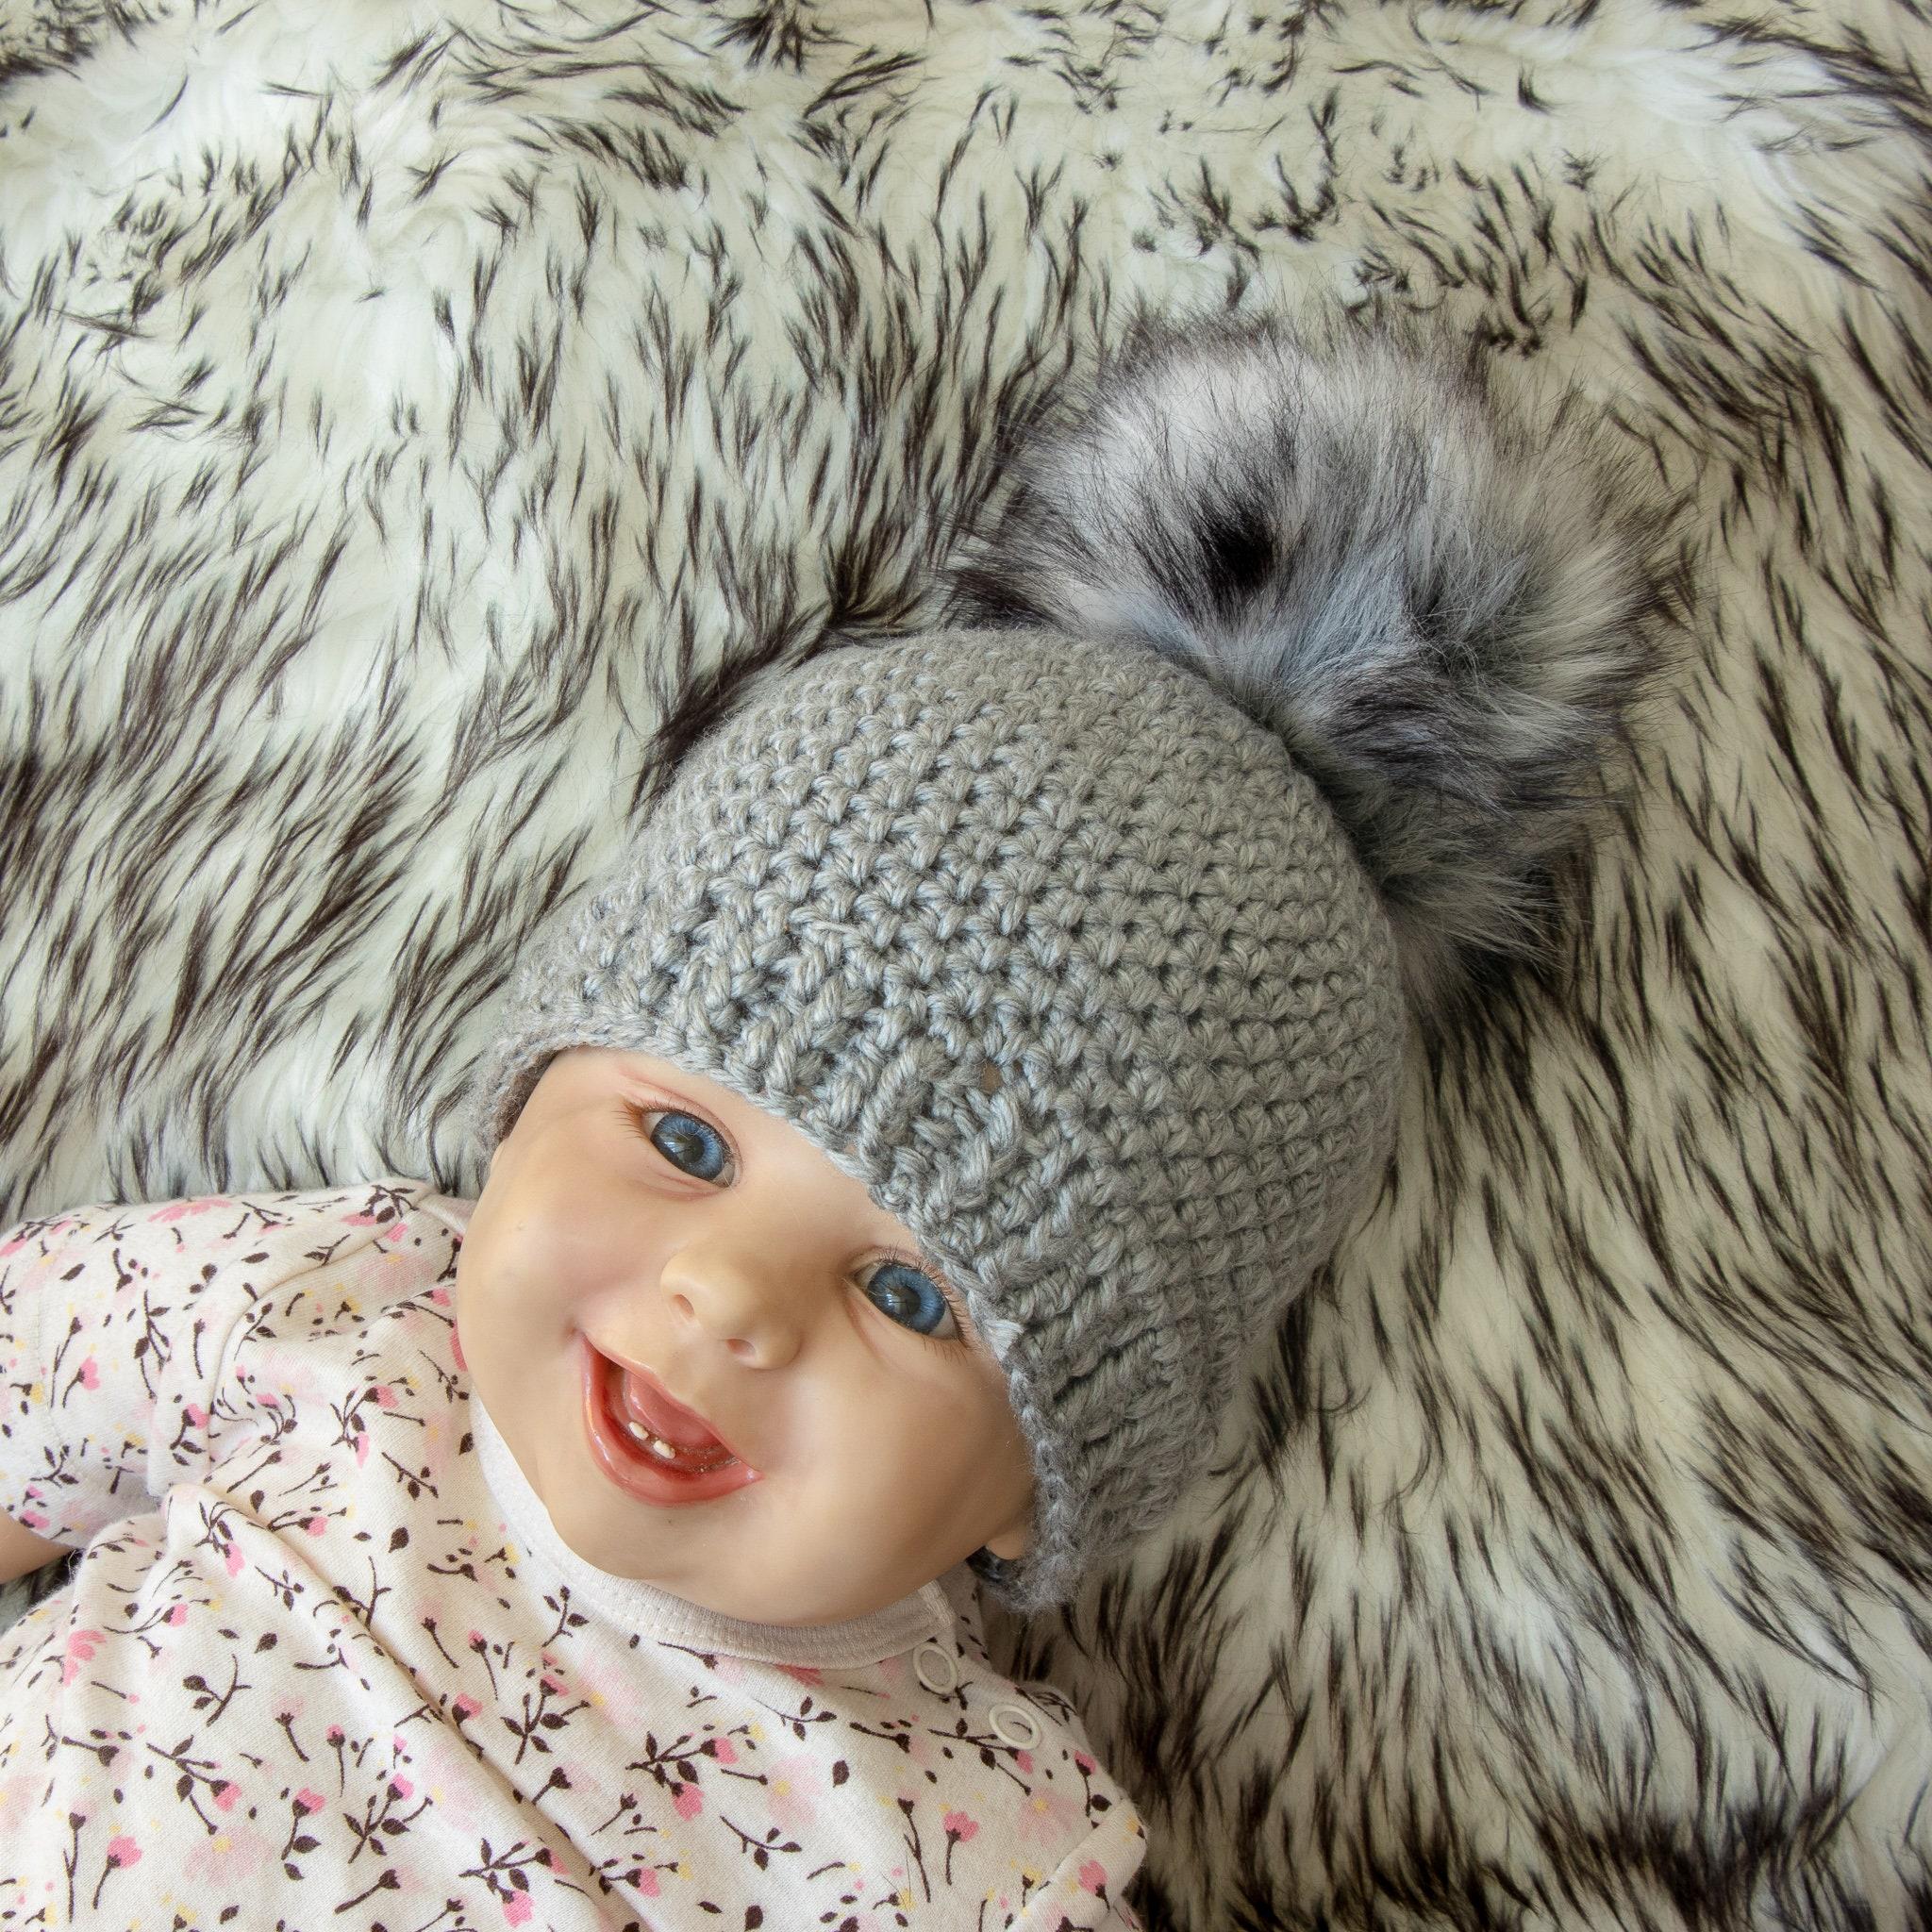 5b4c71e182f Crochet beanie with fur pom pom - Gray Baby hat - Crochet baby hat